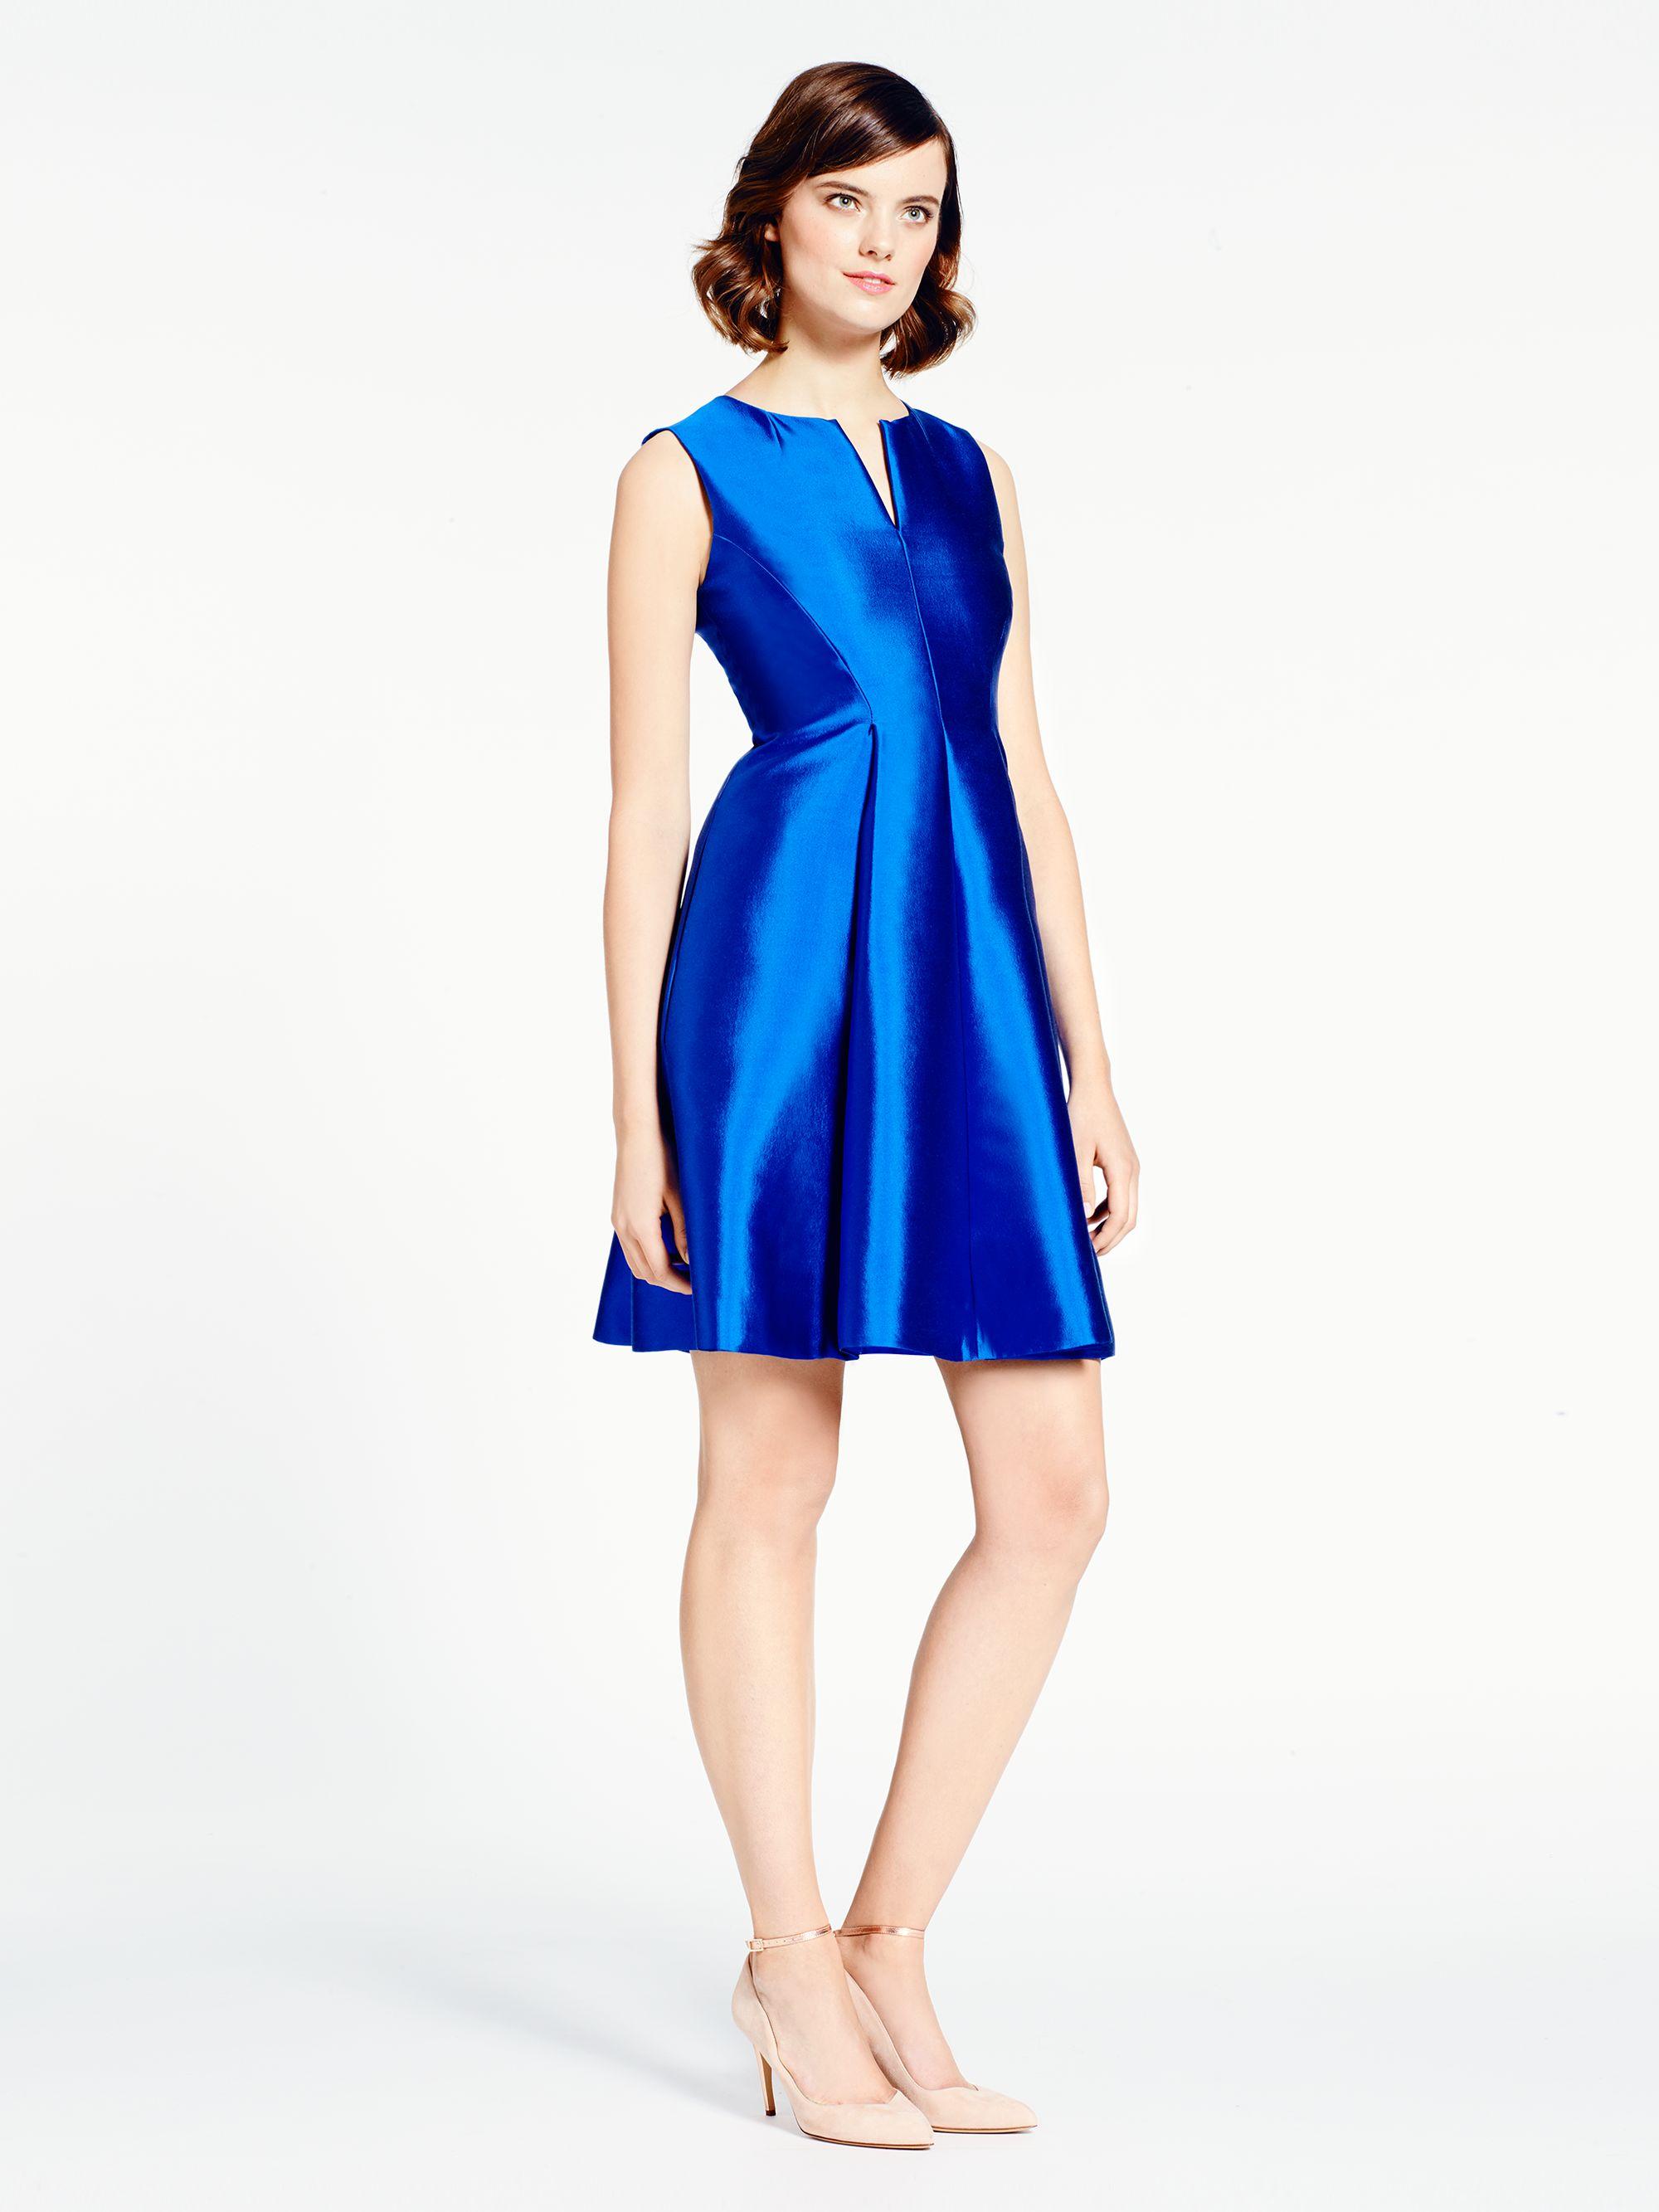 Kate Spade New York Charleen Dress In Blue Lyst